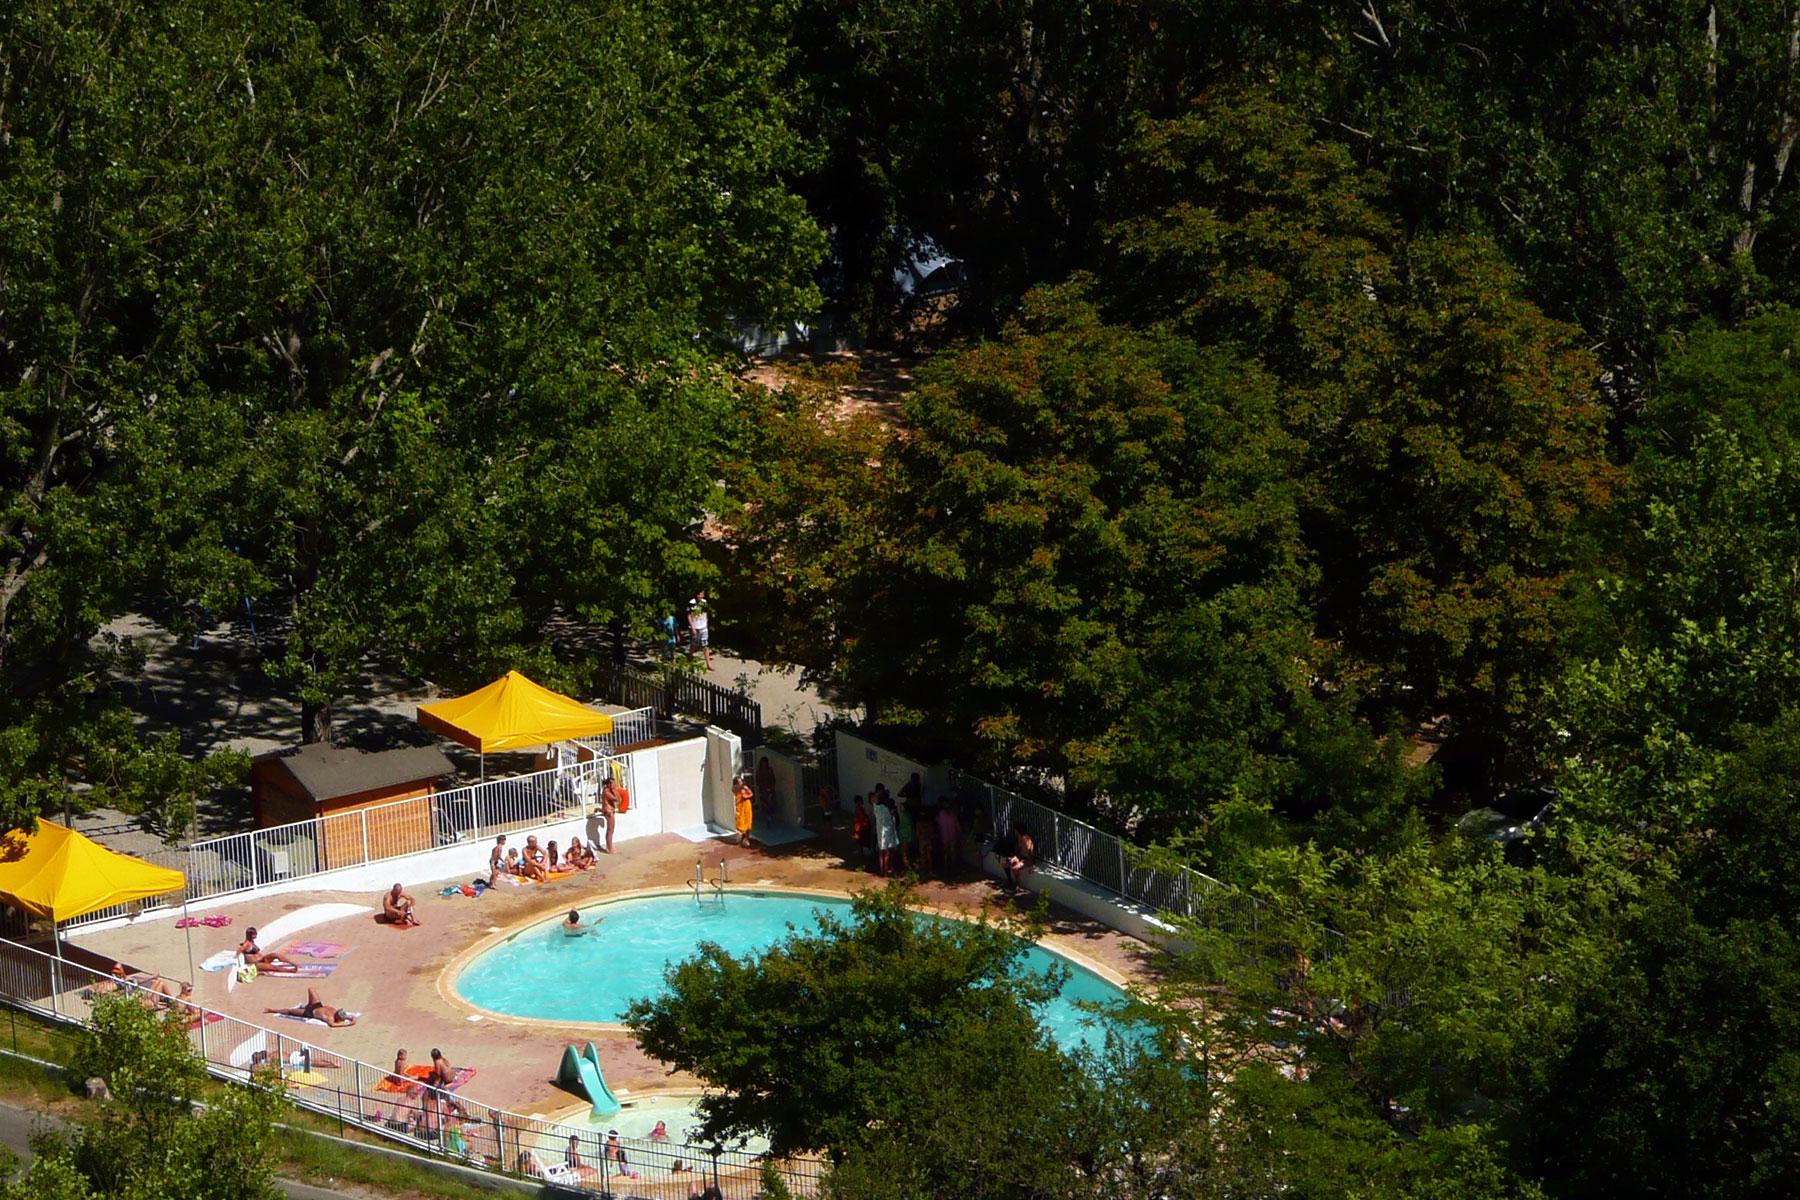 Familly Campsite In The Verdon - Domaine Chasteuil Provence encequiconcerne Camping Gorges Du Verdon Avec Piscine